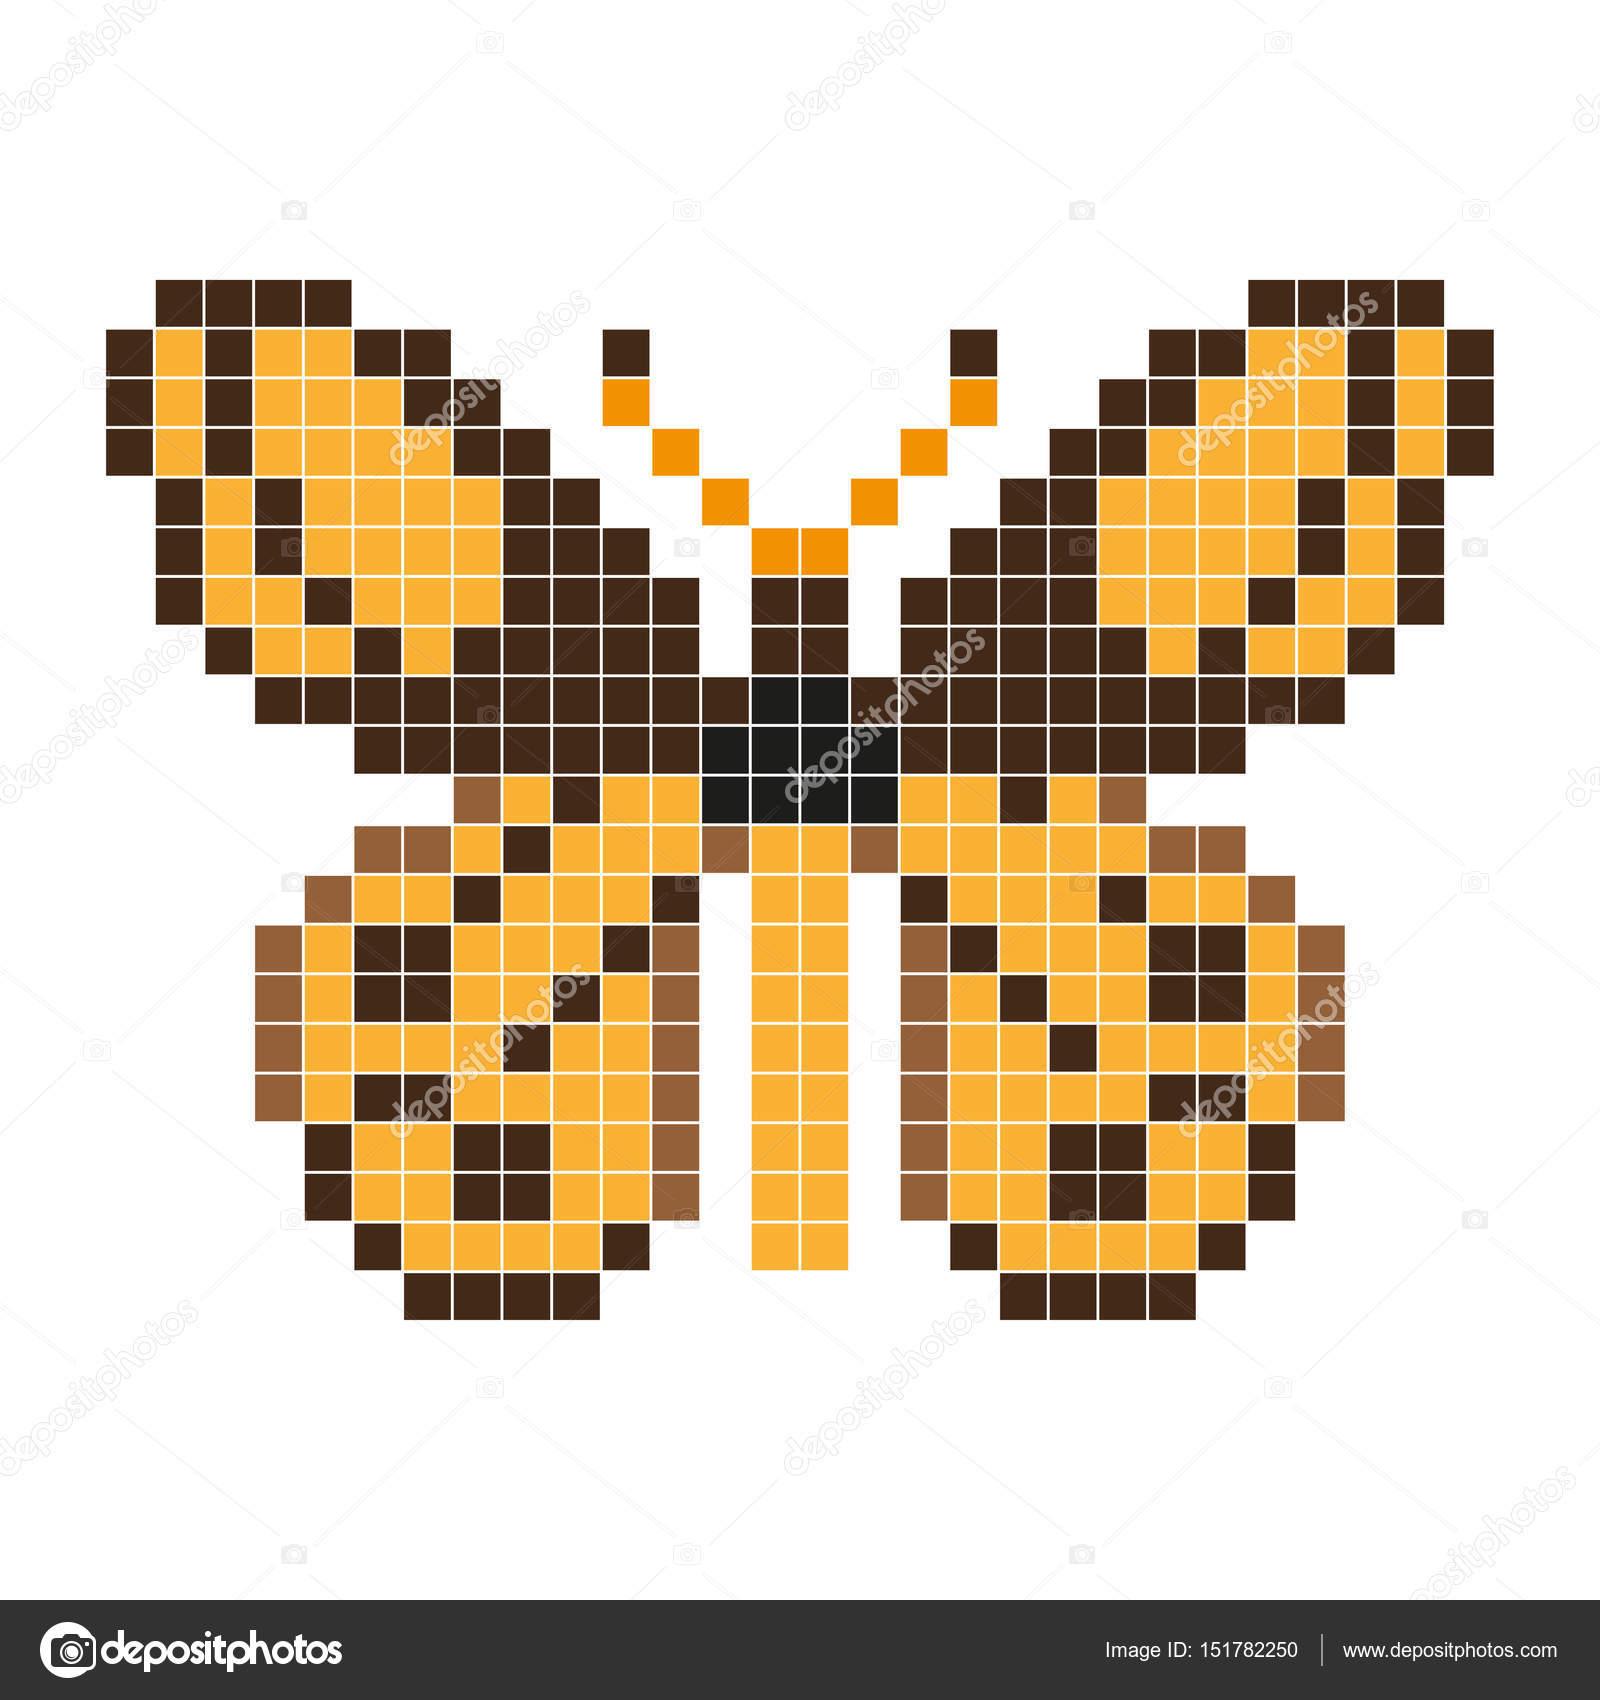 Pixel Art Papillon - Pixel Art Papillon